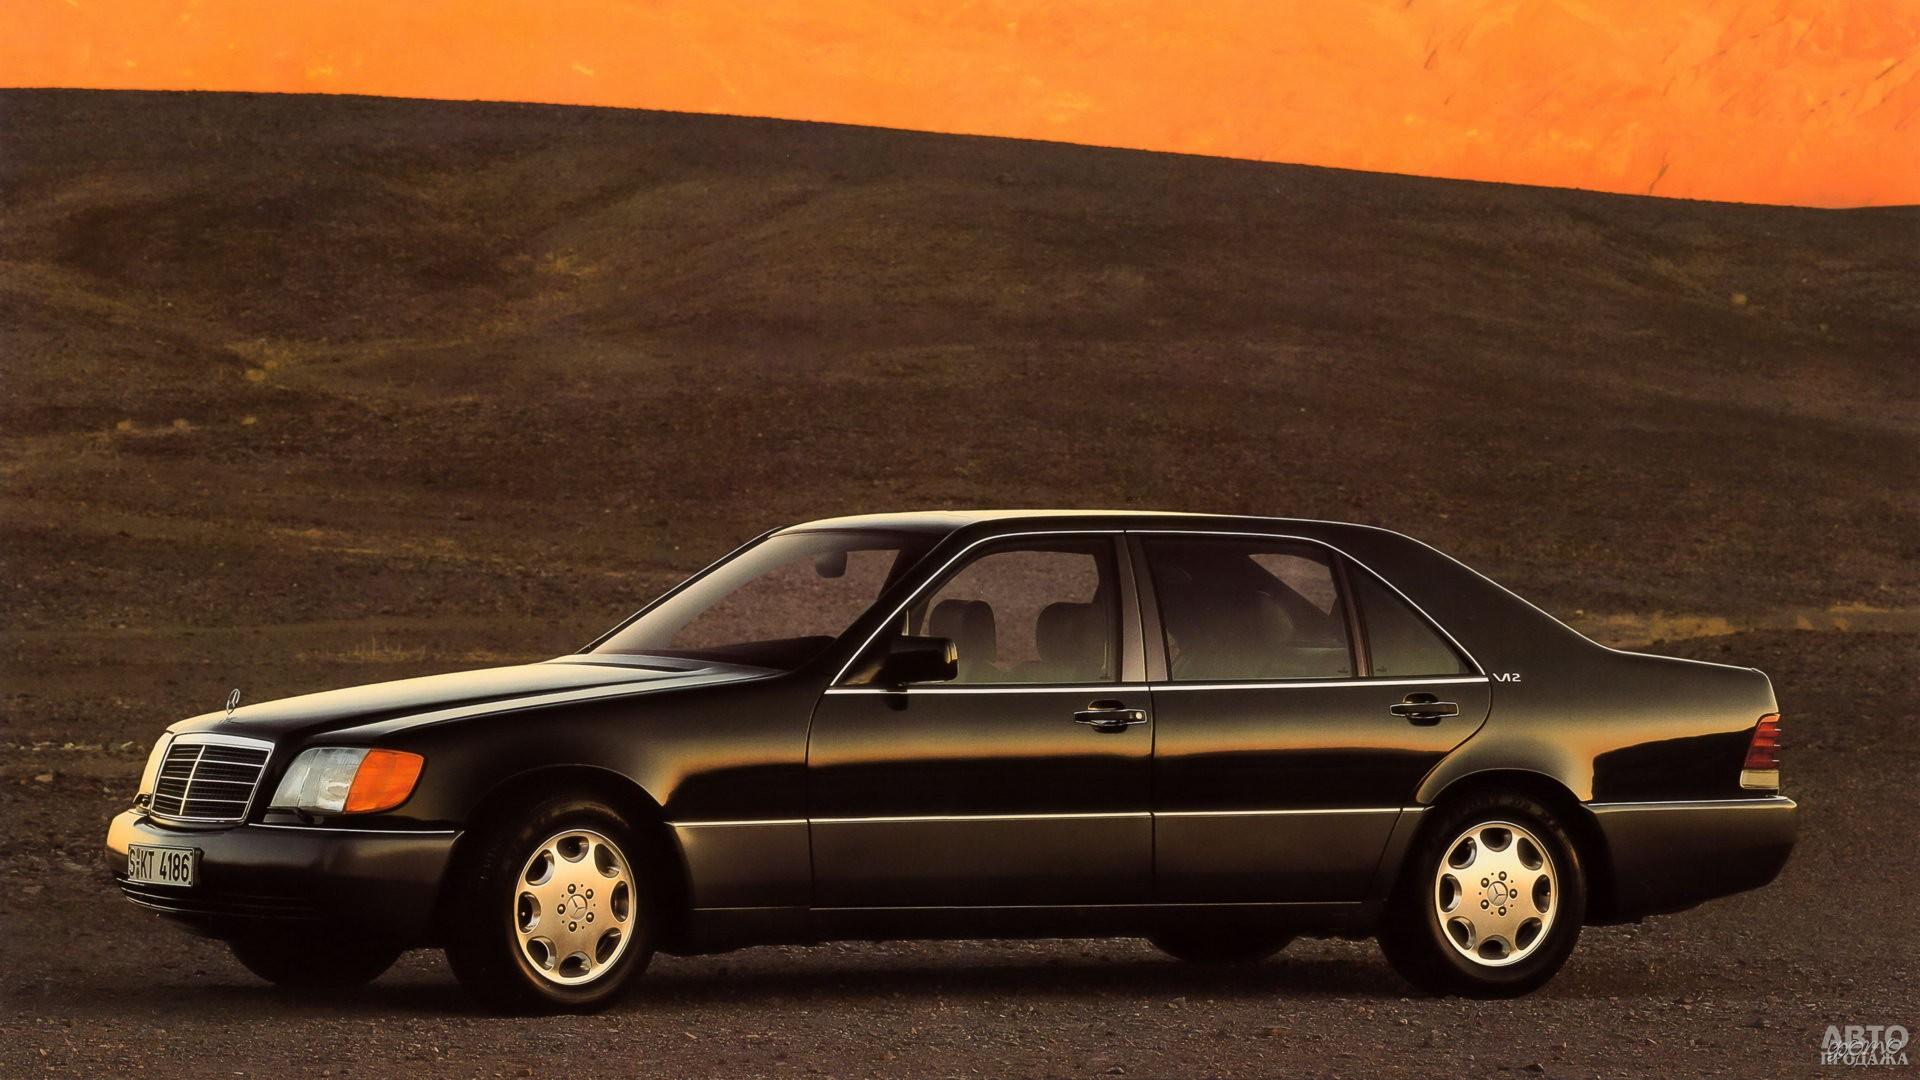 Mercedes-Benz SEL 600 1991 года – вершина модельного ряда W140